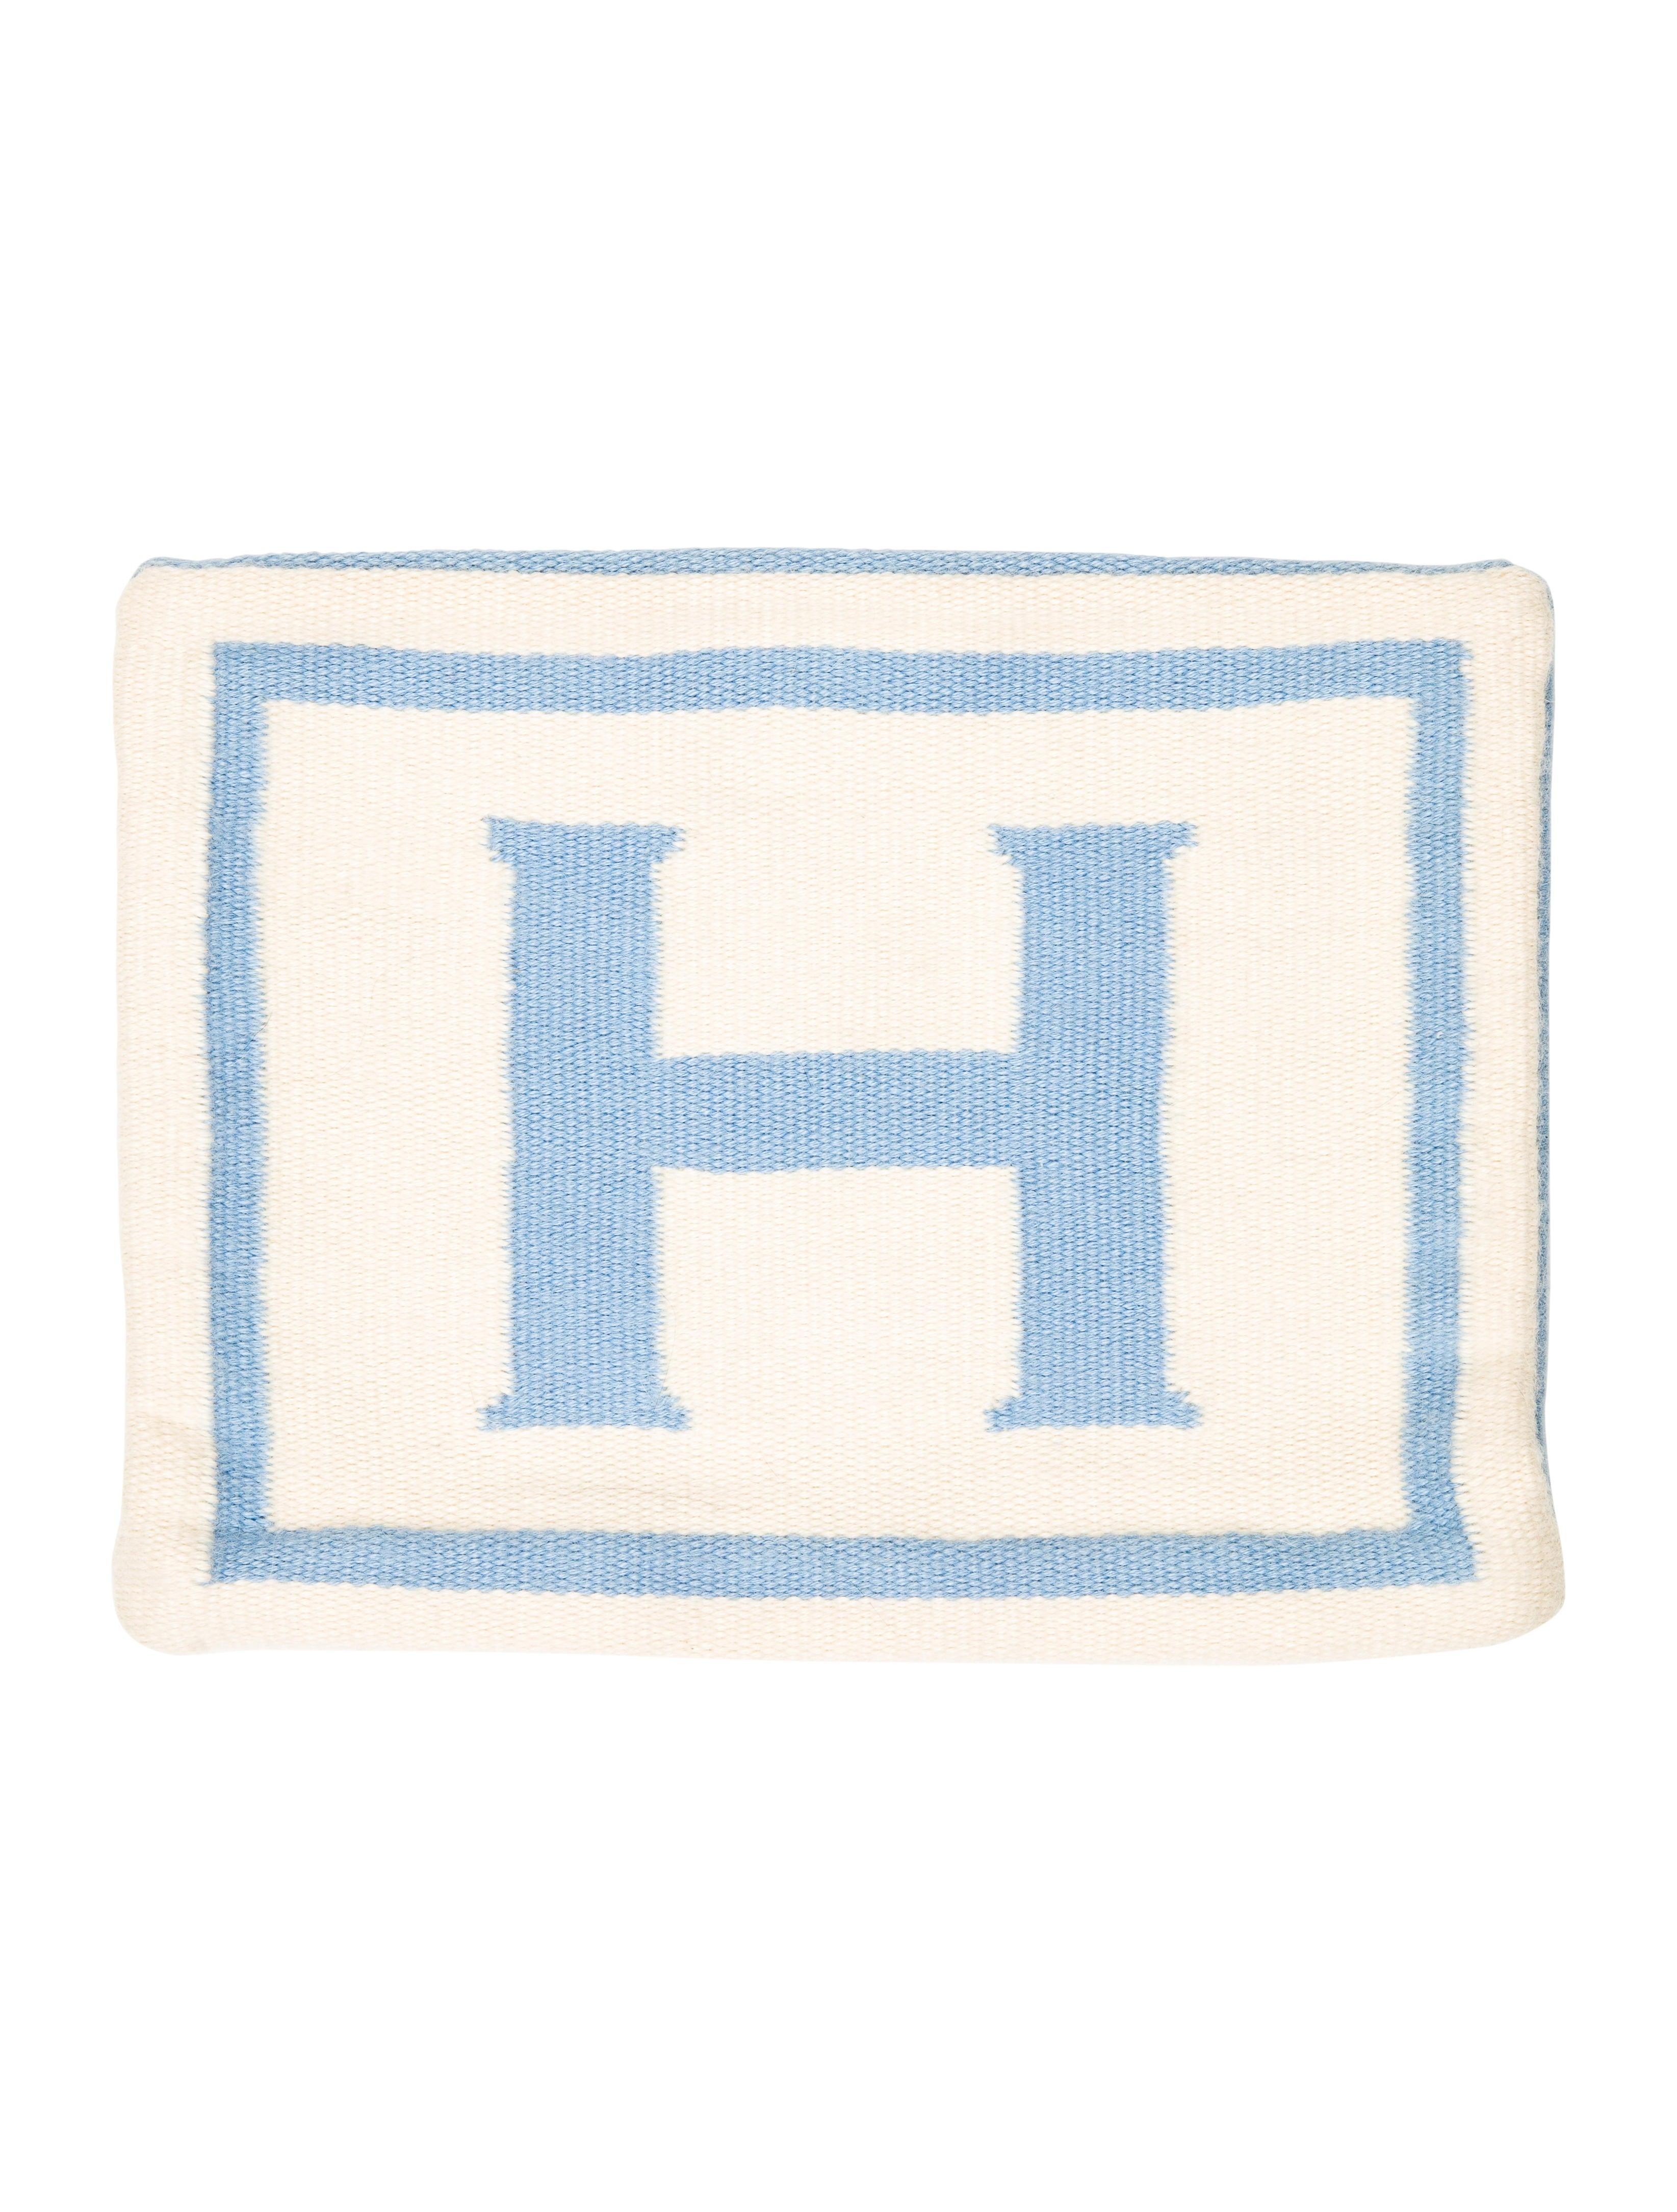 Letter L Throw Pillow : Jonathan Adler Reversible Junior Letter Throw Pillow Case - Bedding And Bath - JTADL20507 The ...